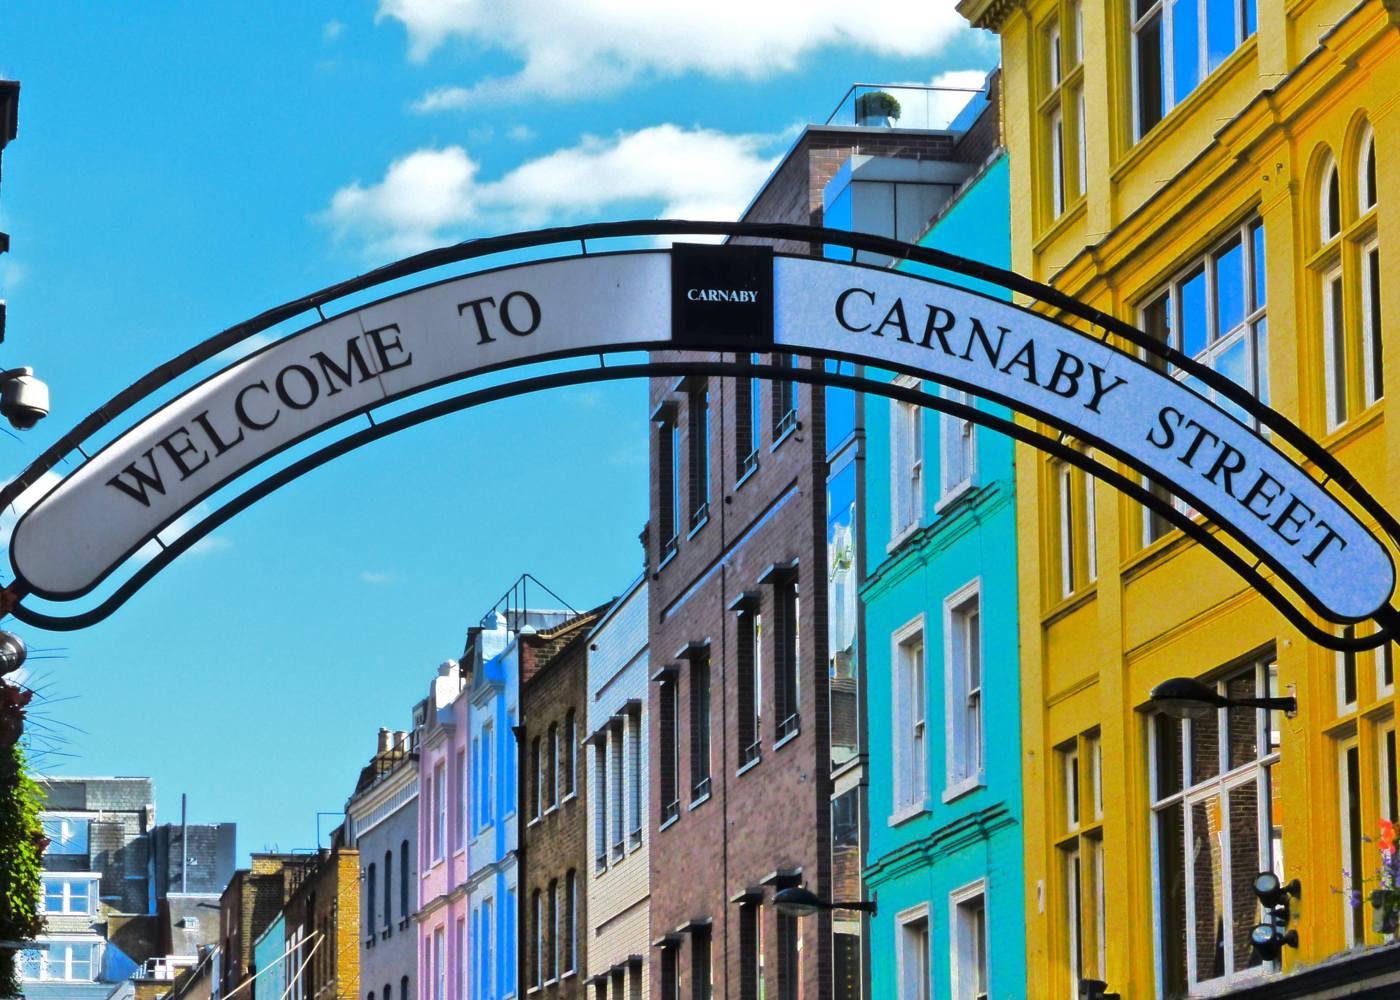 Placa de Carnaby Street